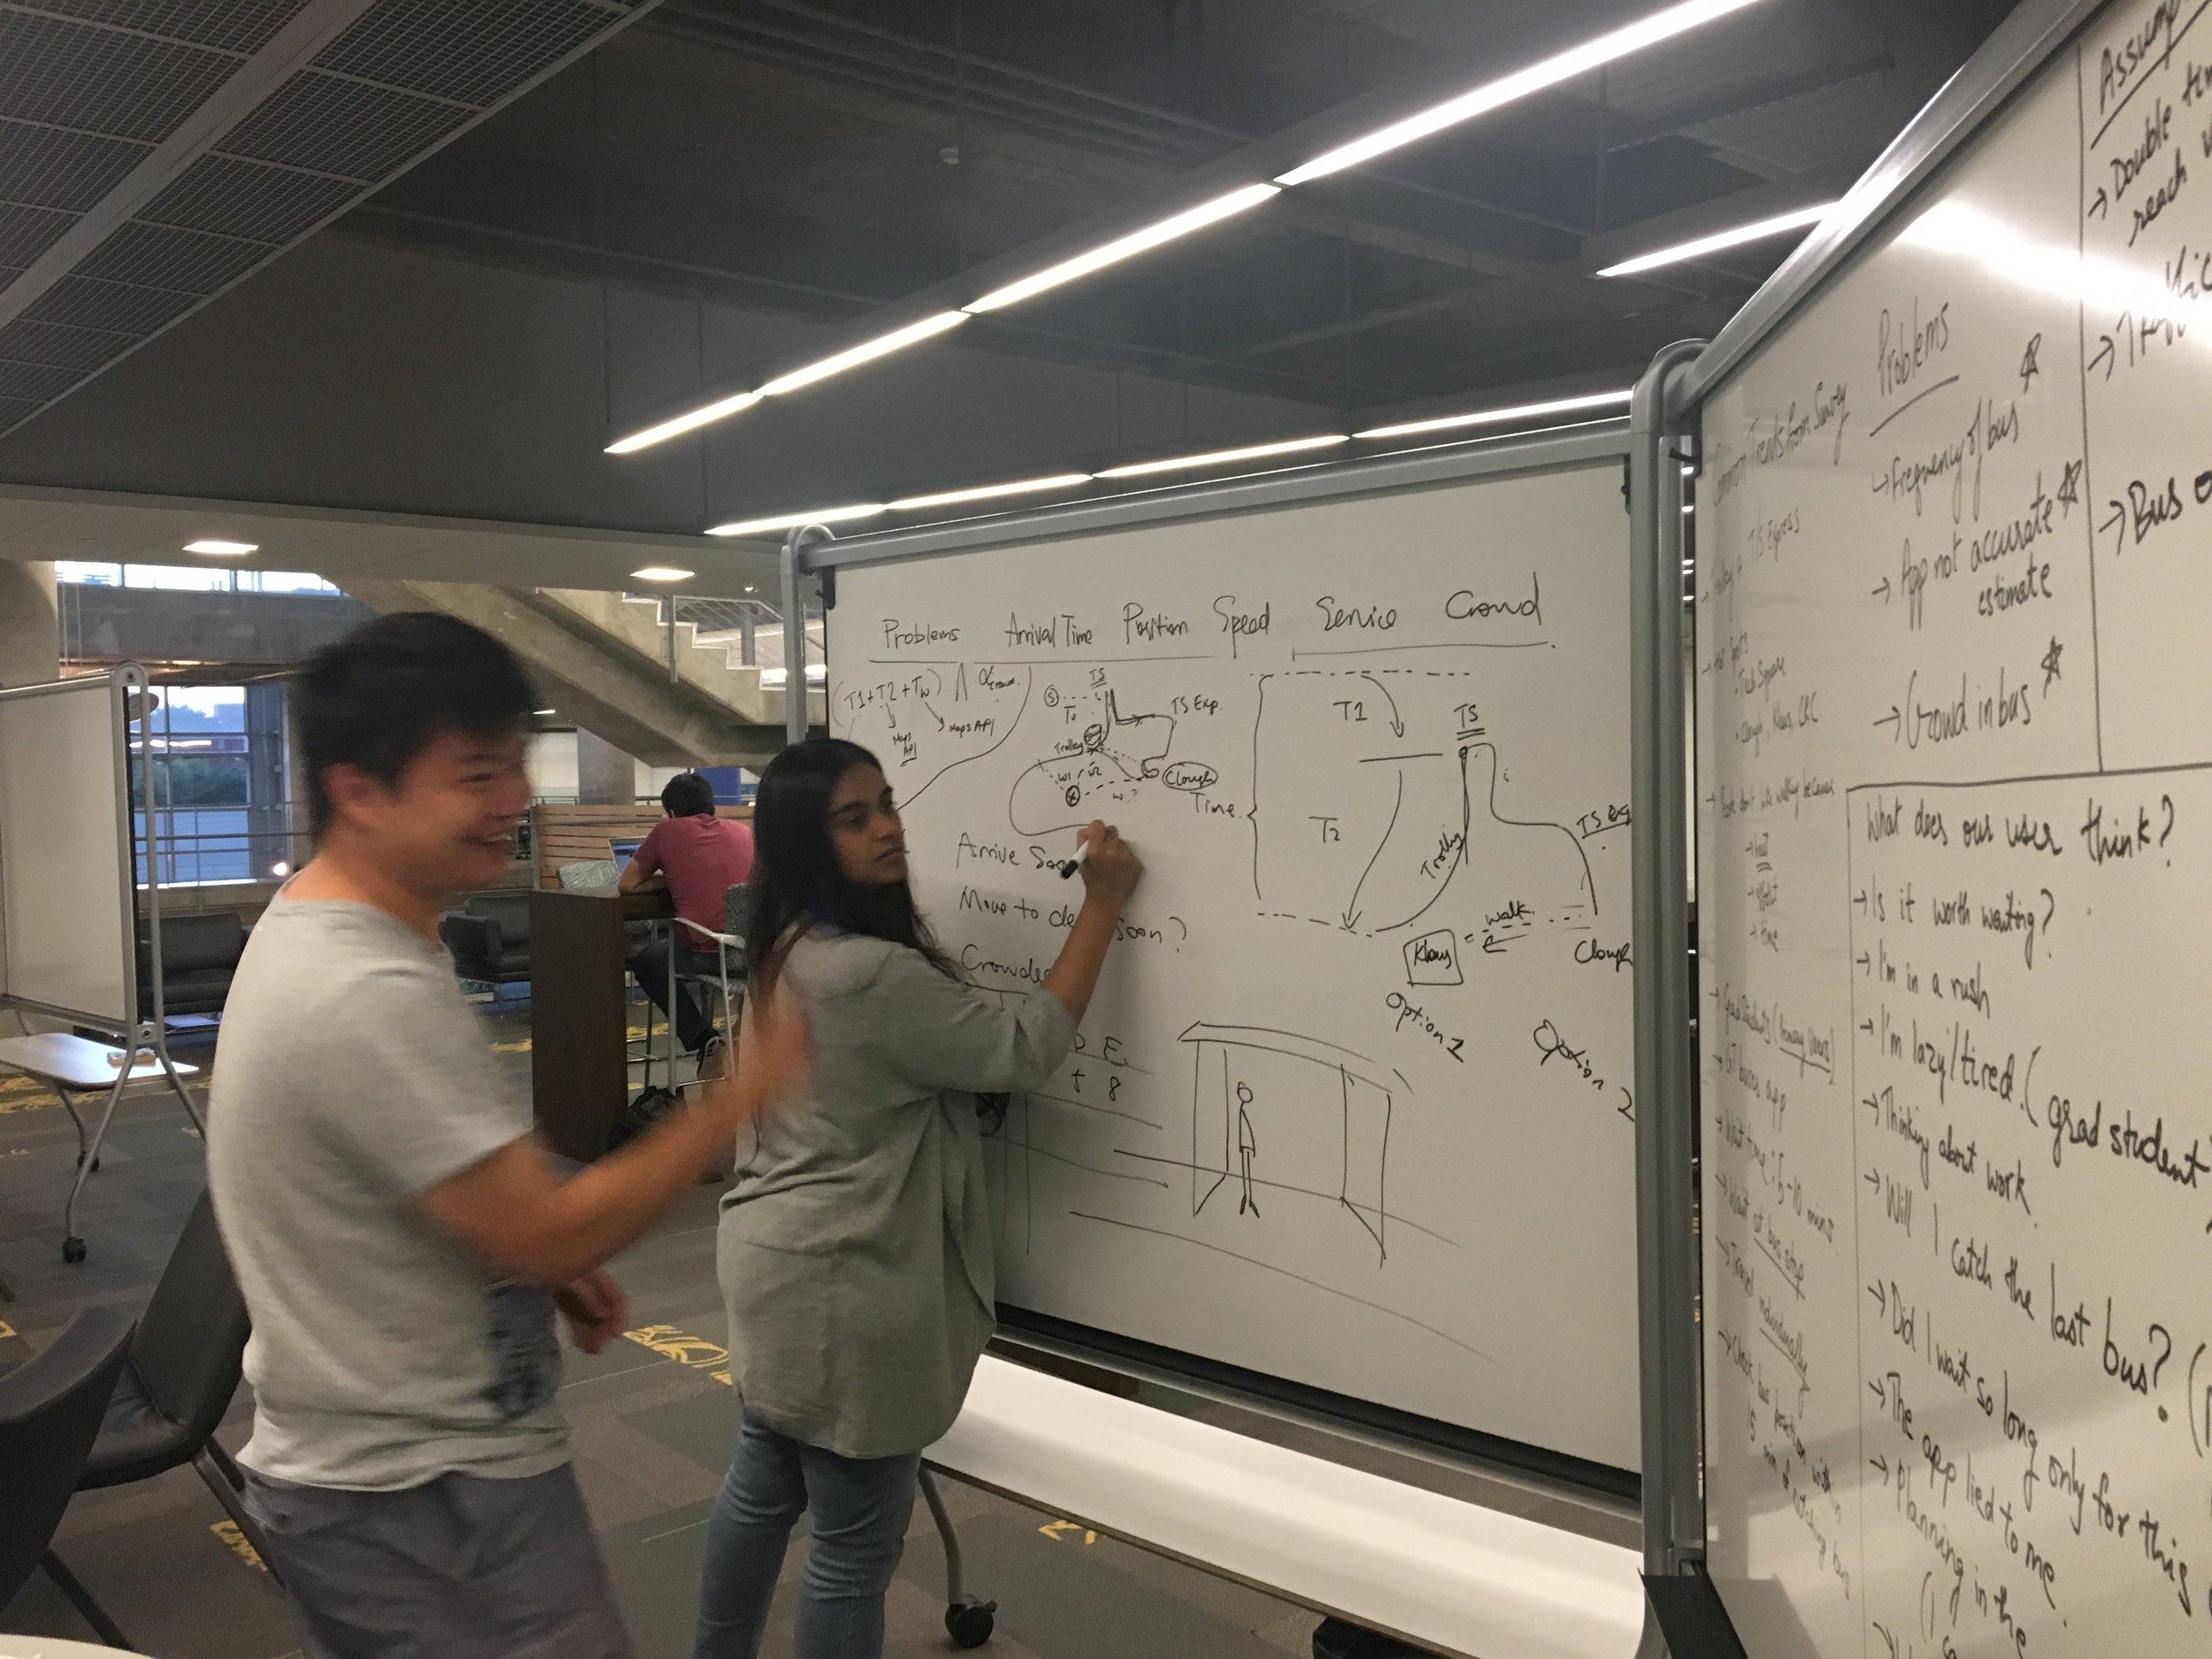 Whiteboard Brainstorming!